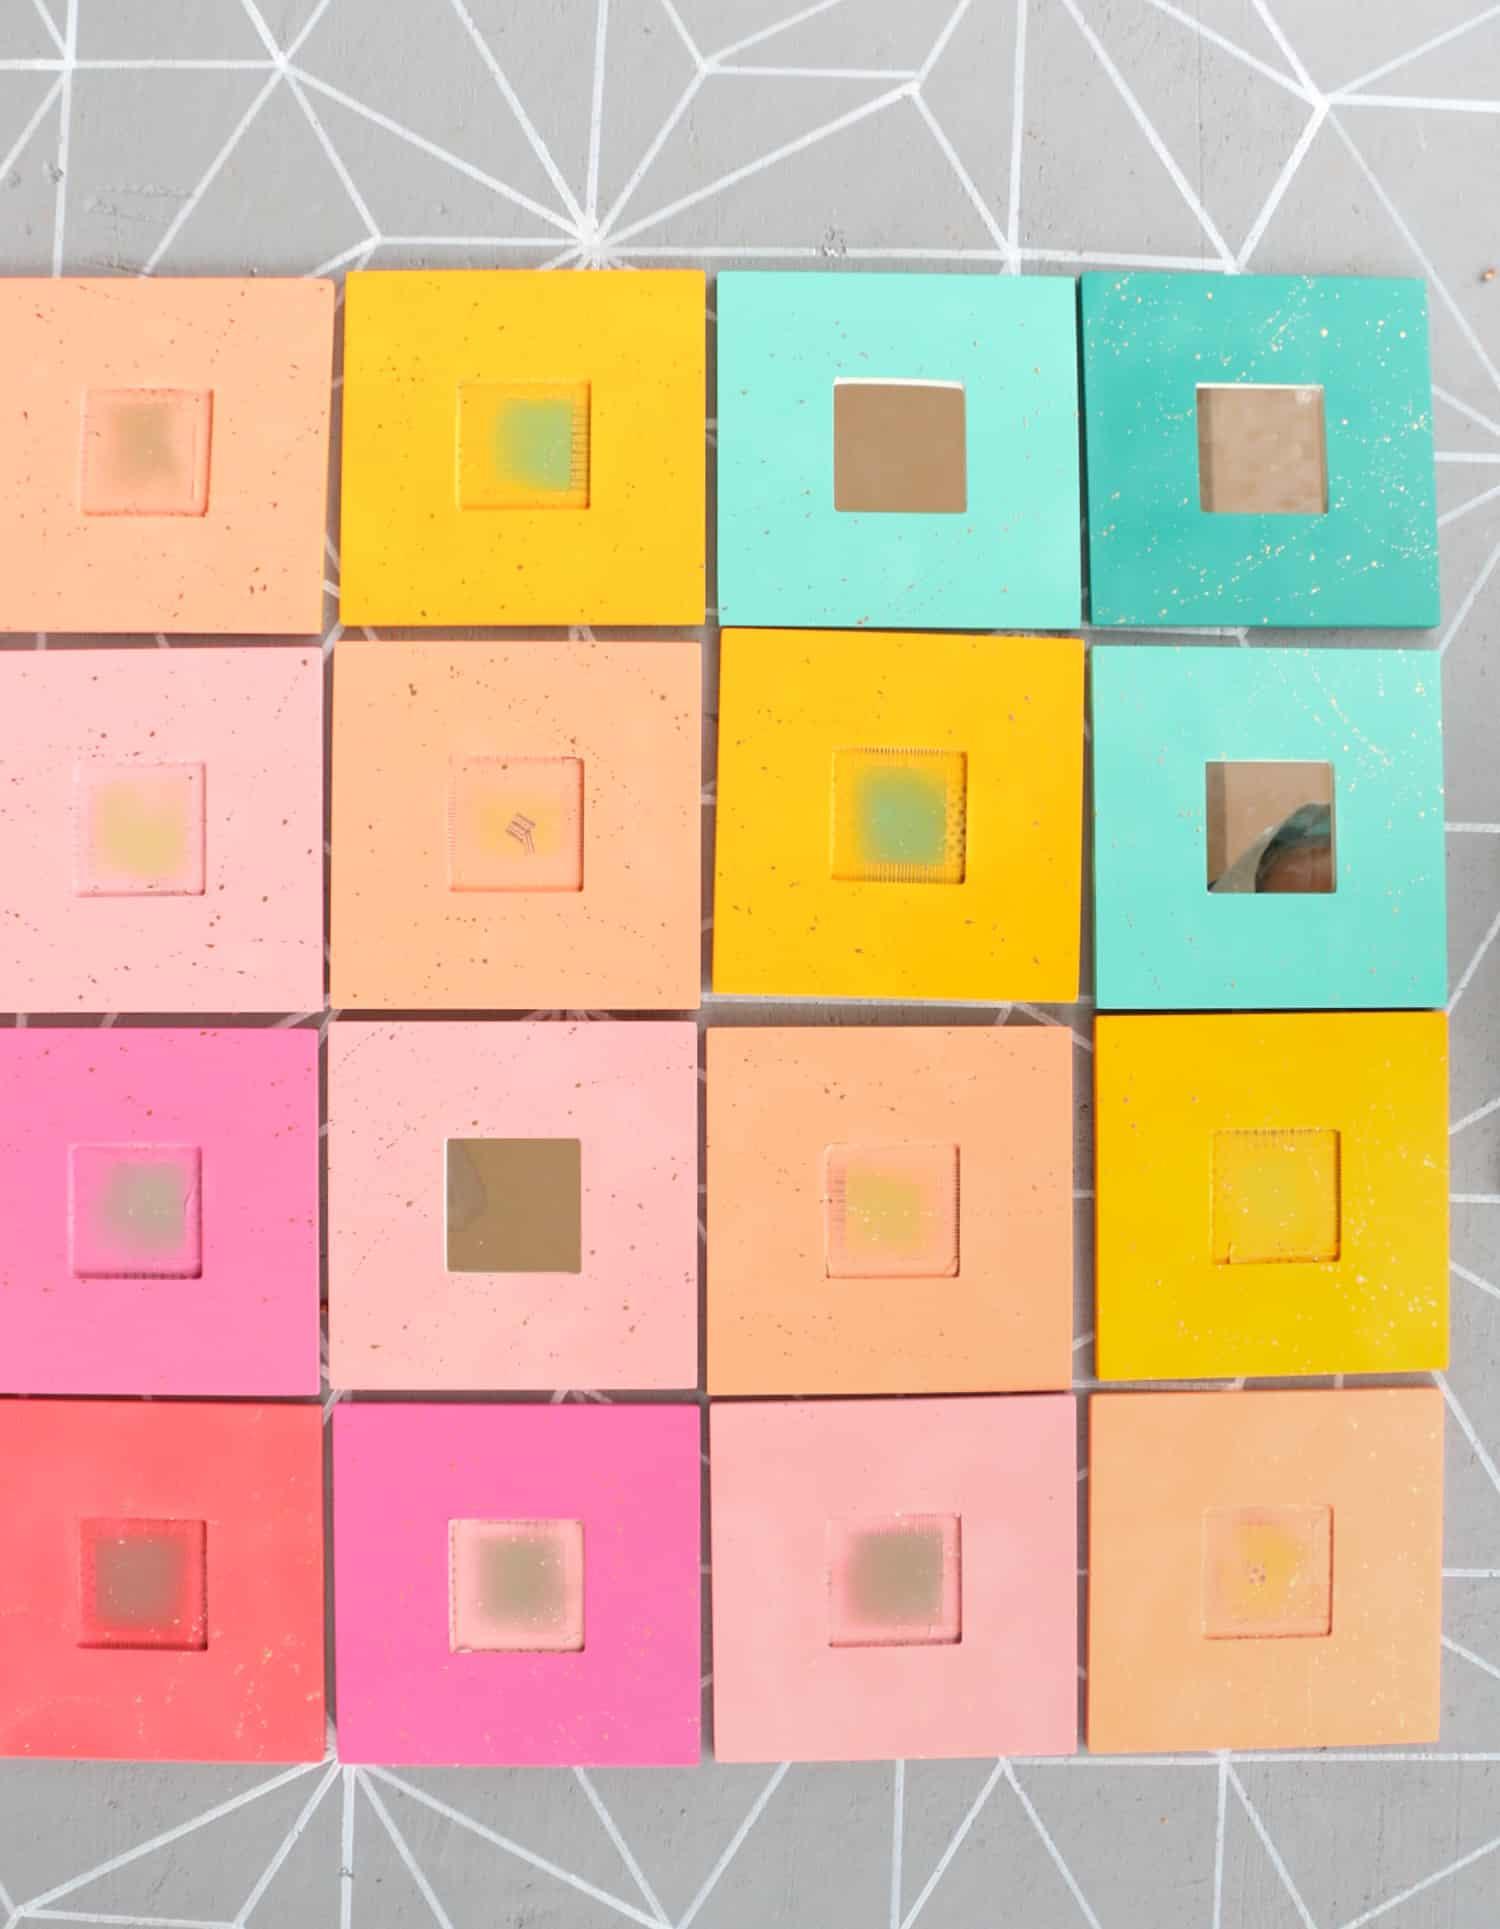 DIY-Splatter-Painted-Mirror-Wall-Art-Click-Through-for-Tutorial-_